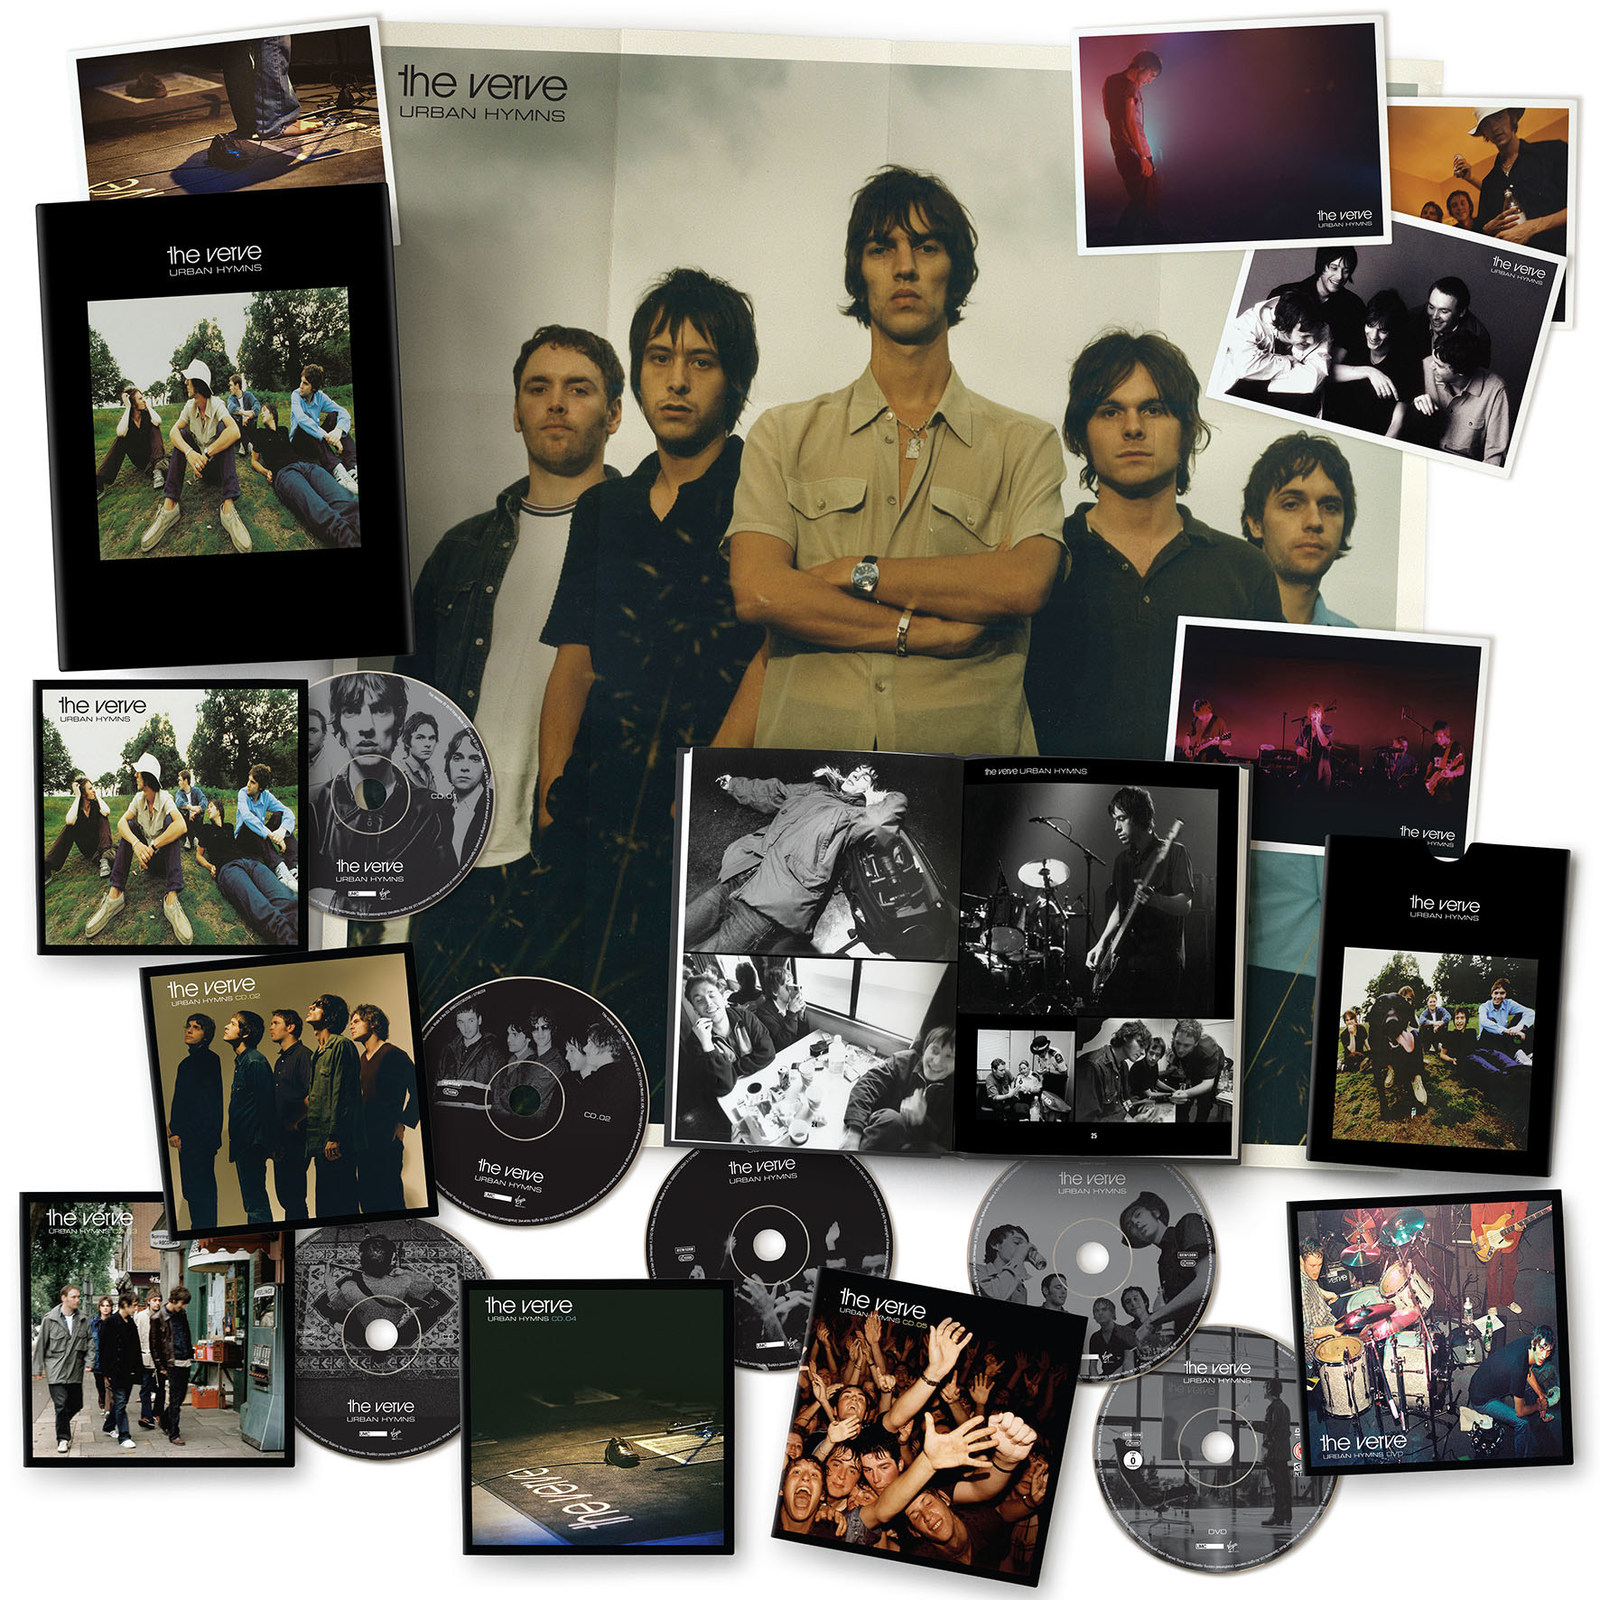 Юбилейный альбом The Verve -Urban Hymns: 20thAnniversary Edition